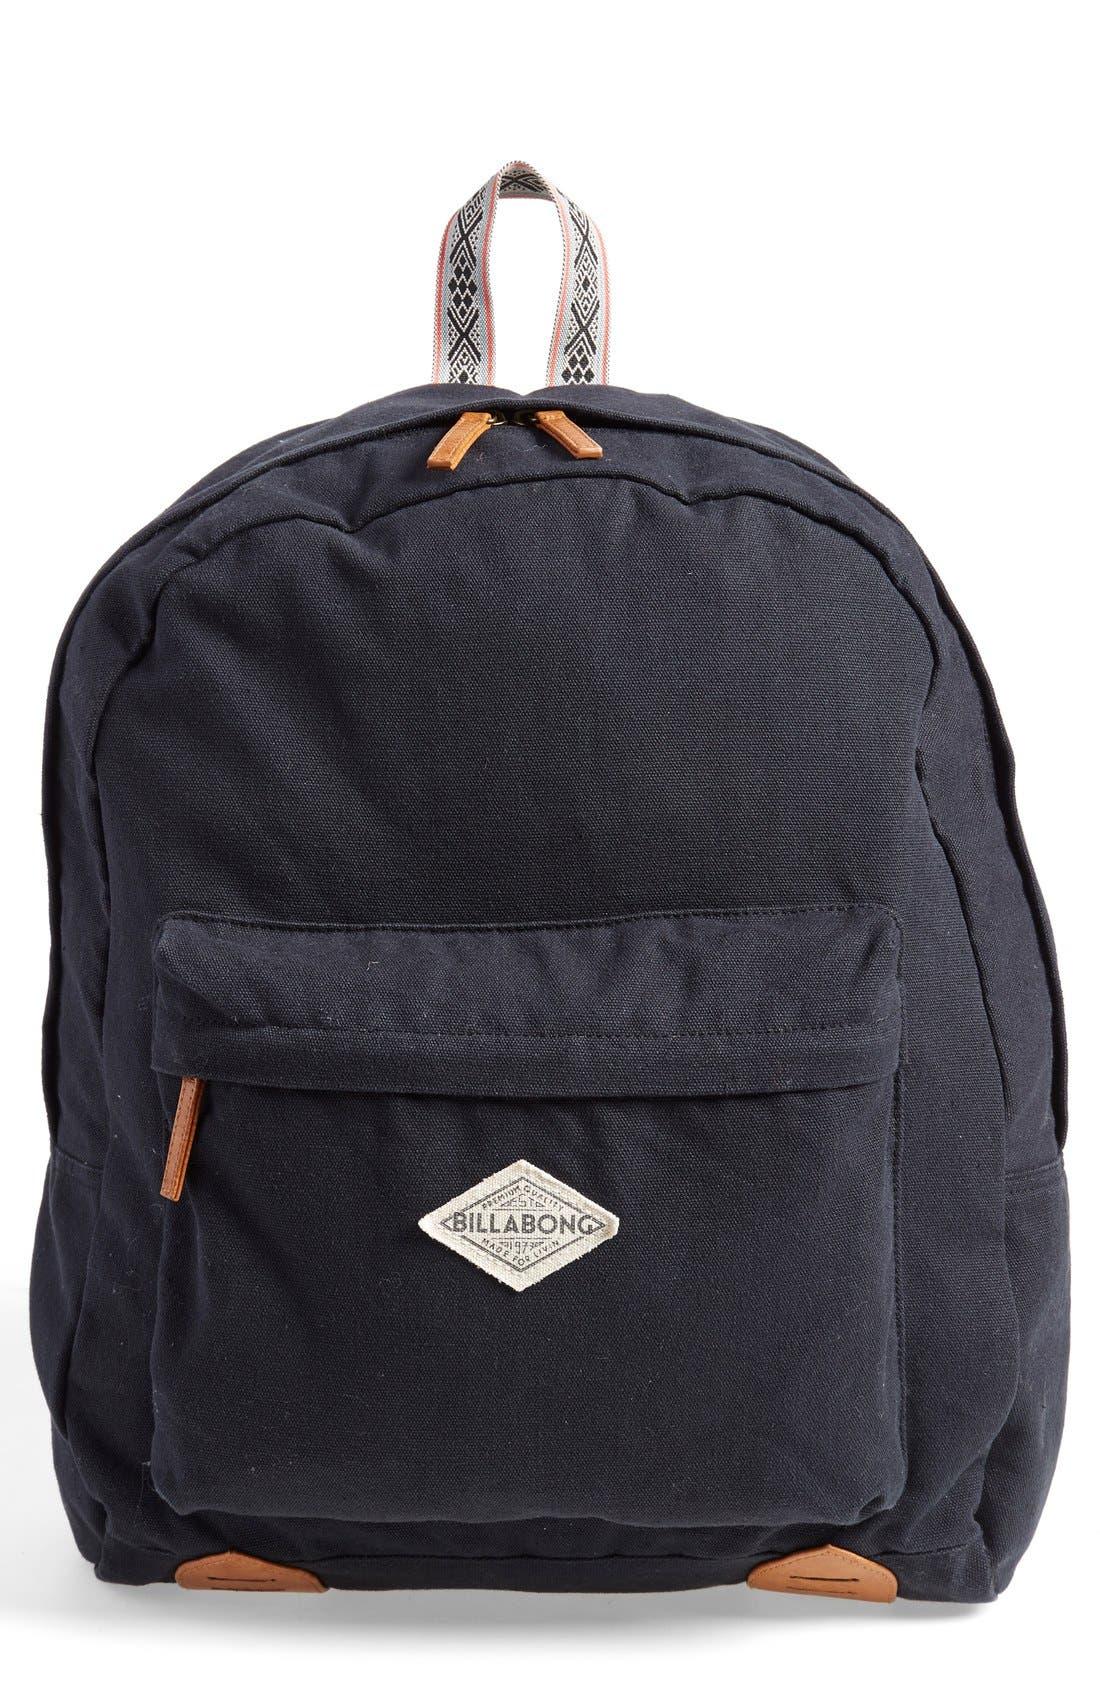 Main Image - Billabong 'Swept Summer' Backpack